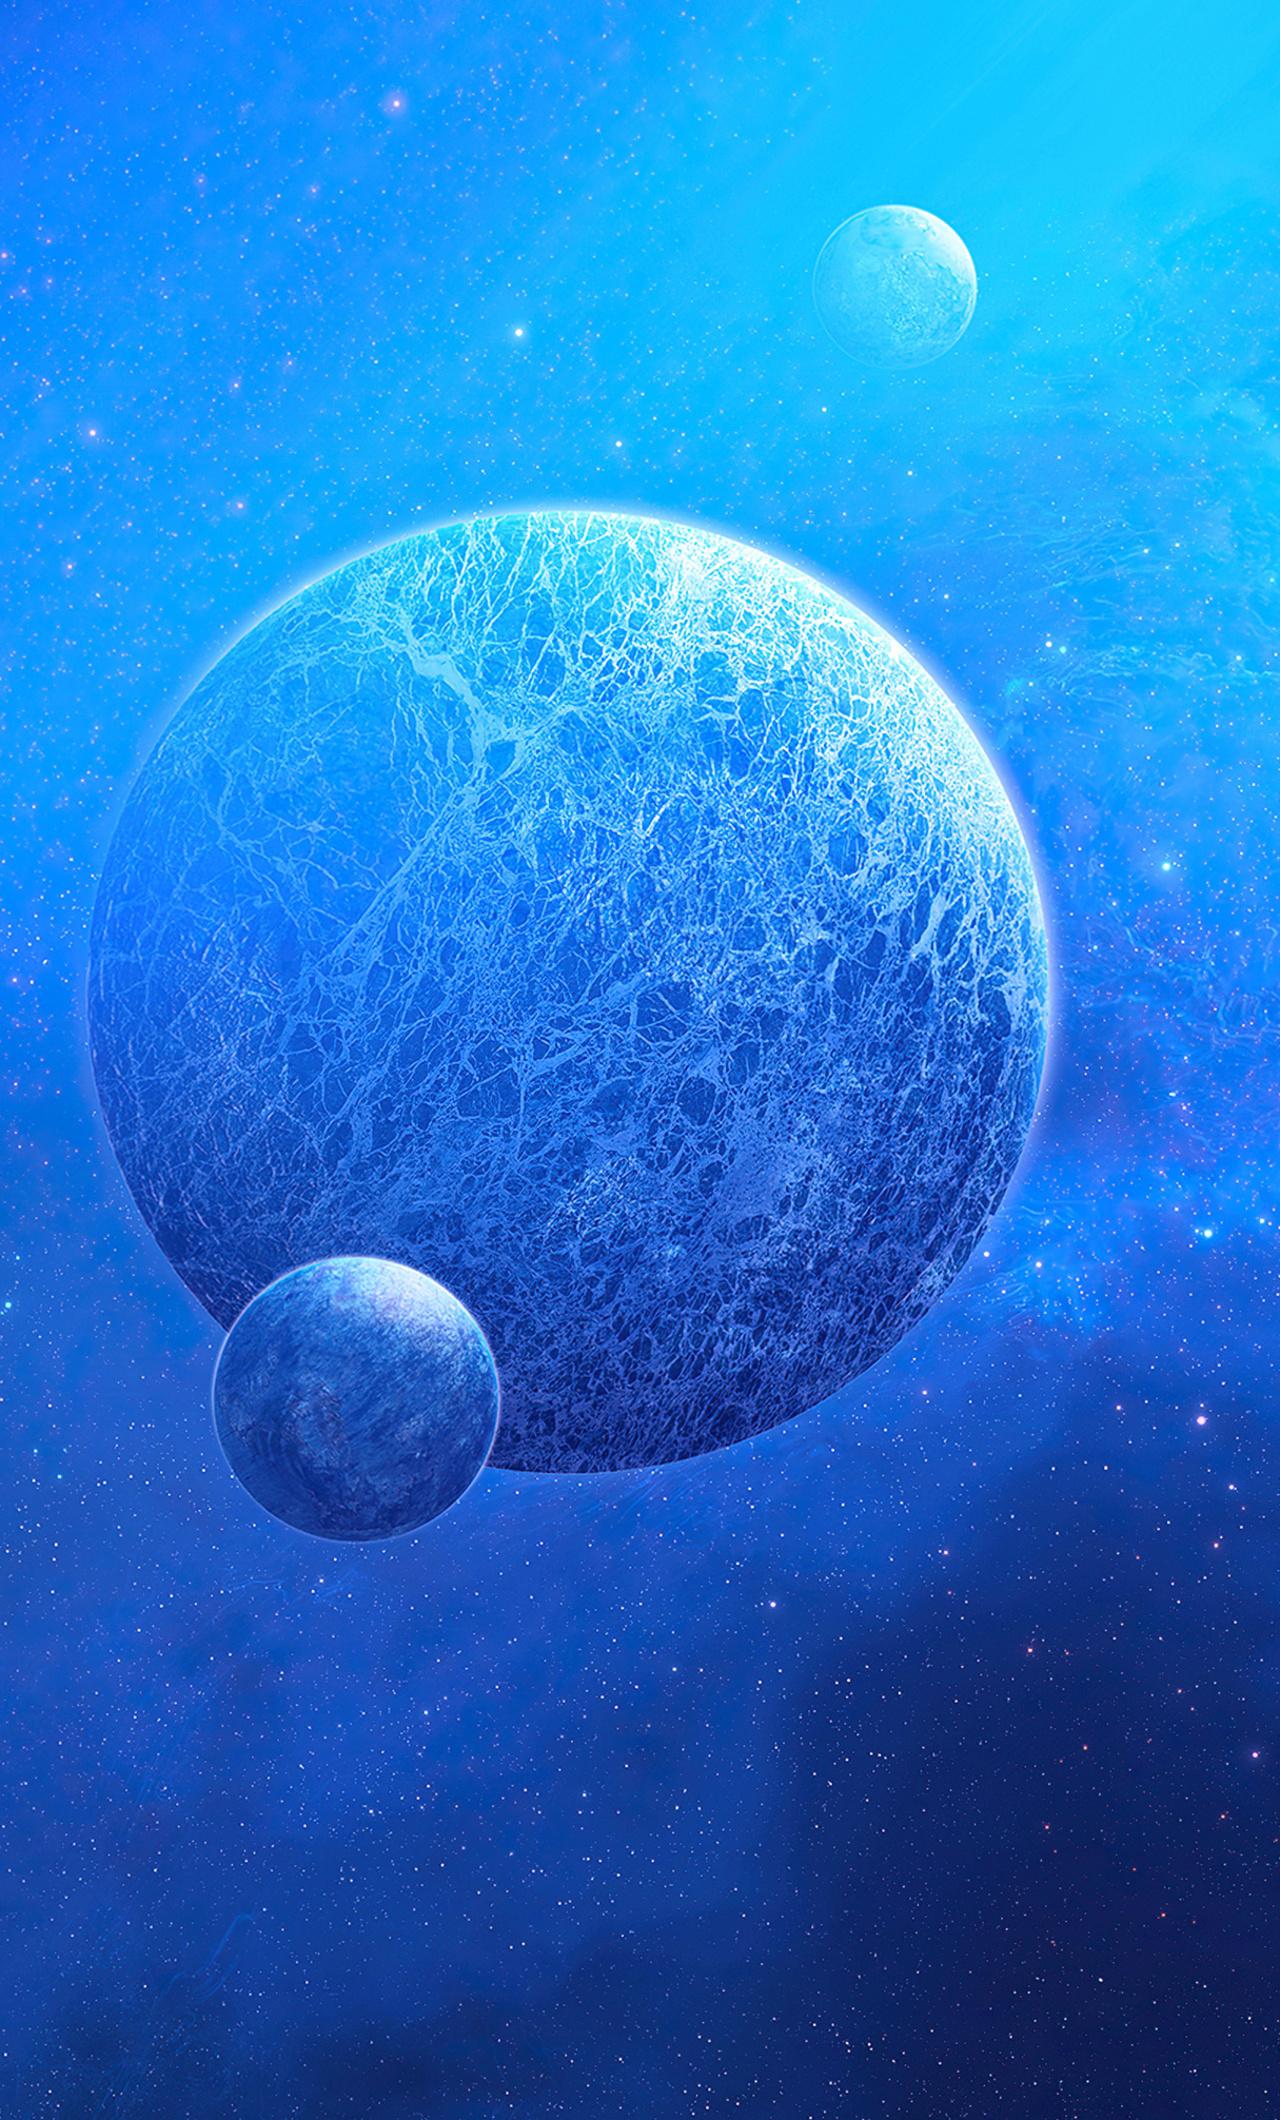 icy-planet-m1.jpg